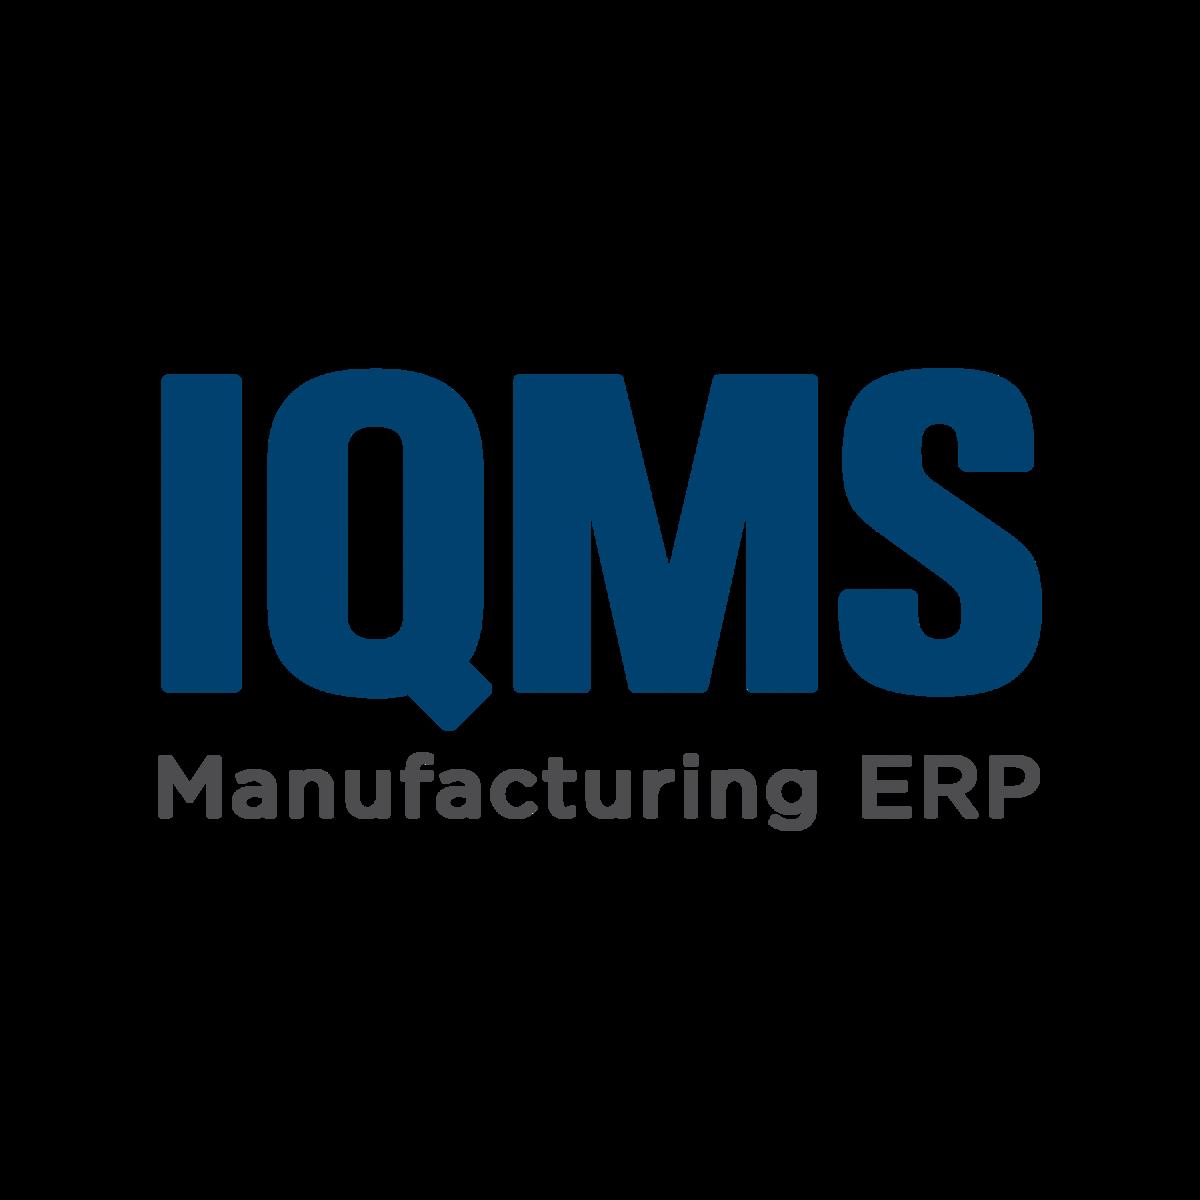 EnterpriseIQ Manufacturing ERP logo